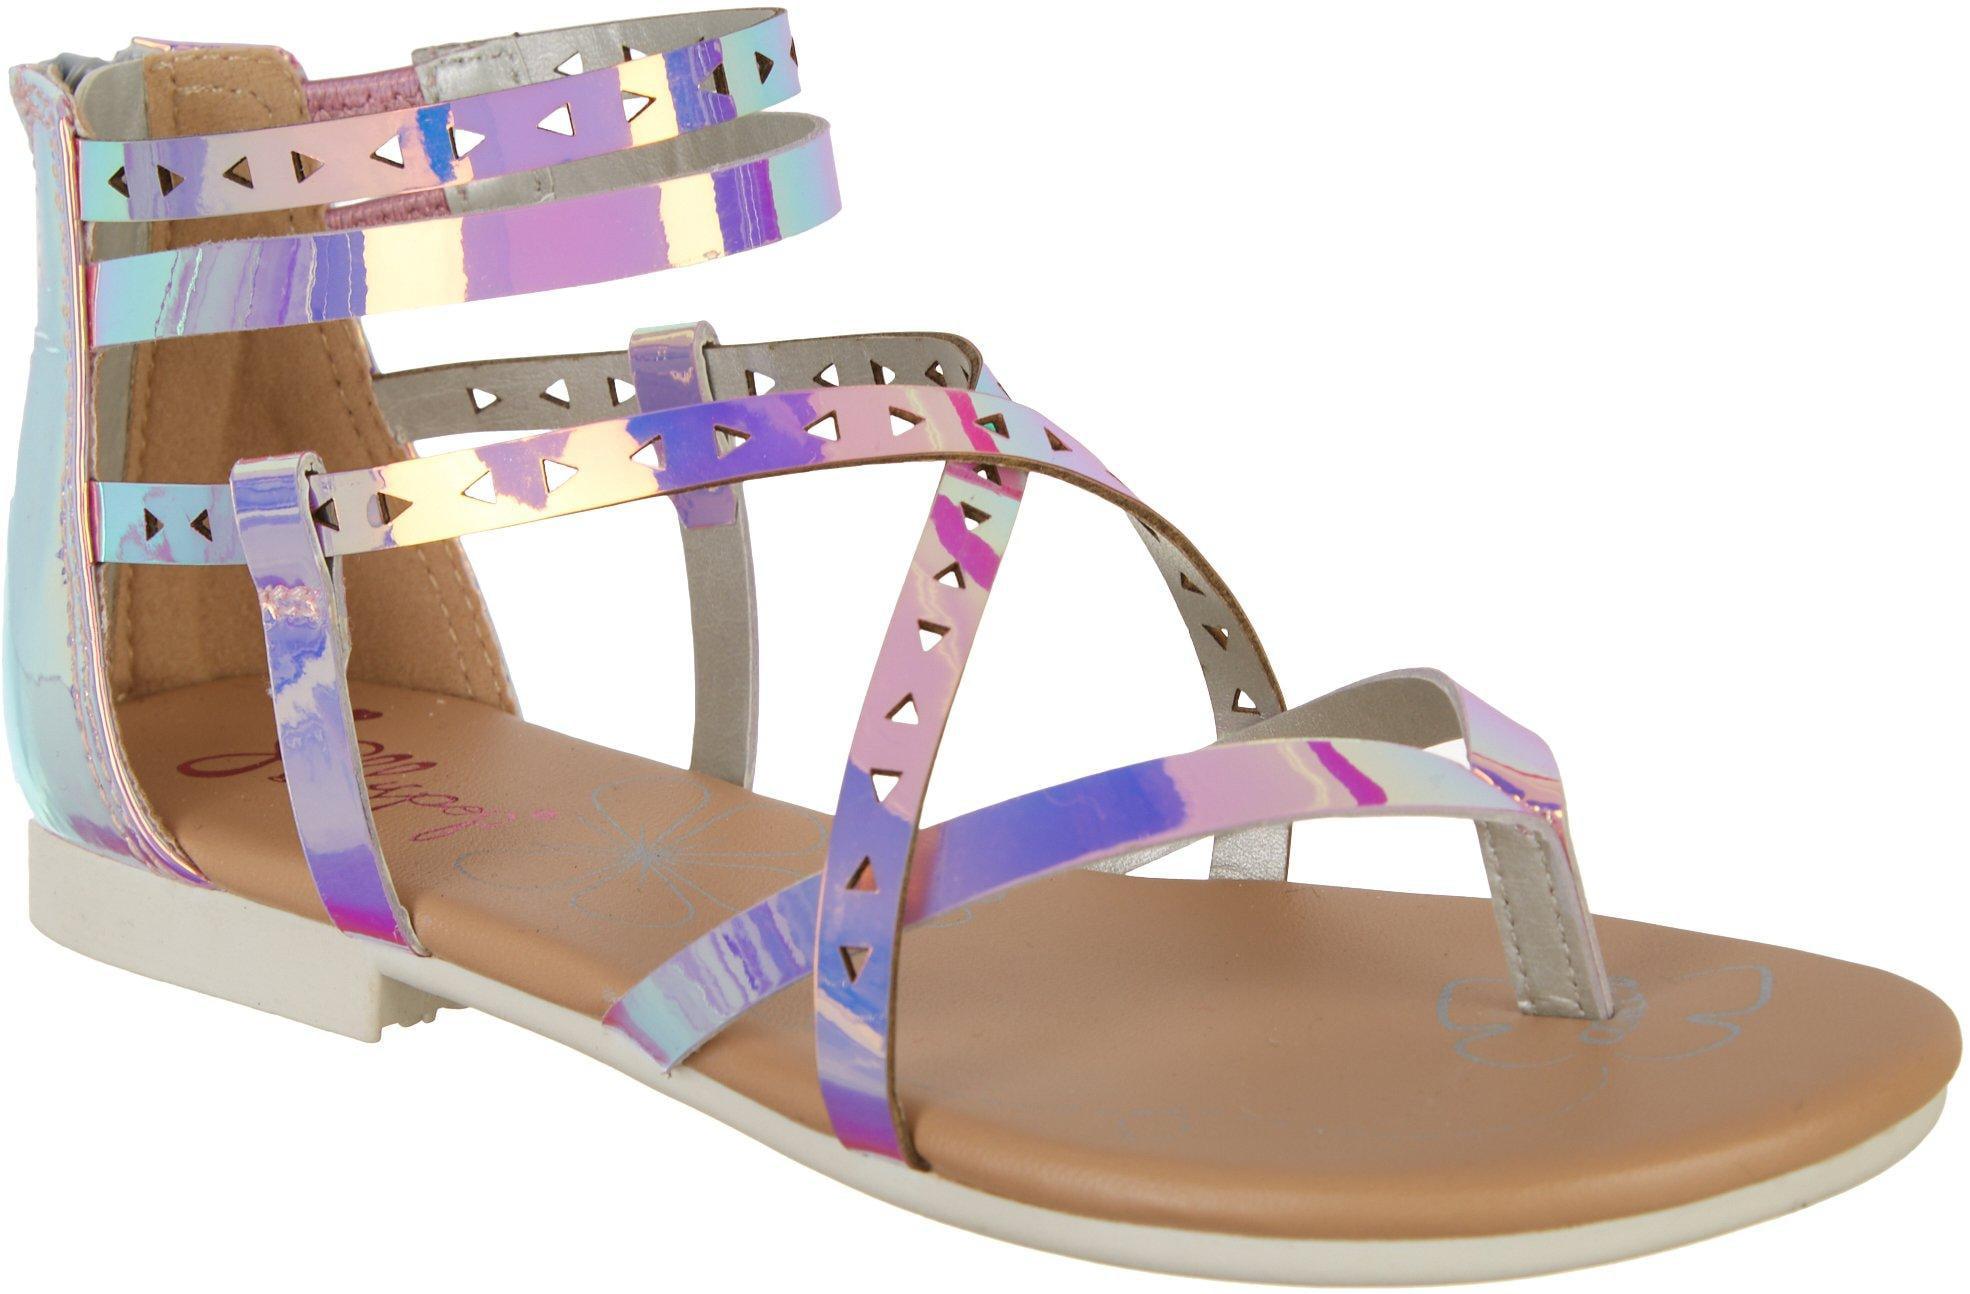 jellypop girls sandals